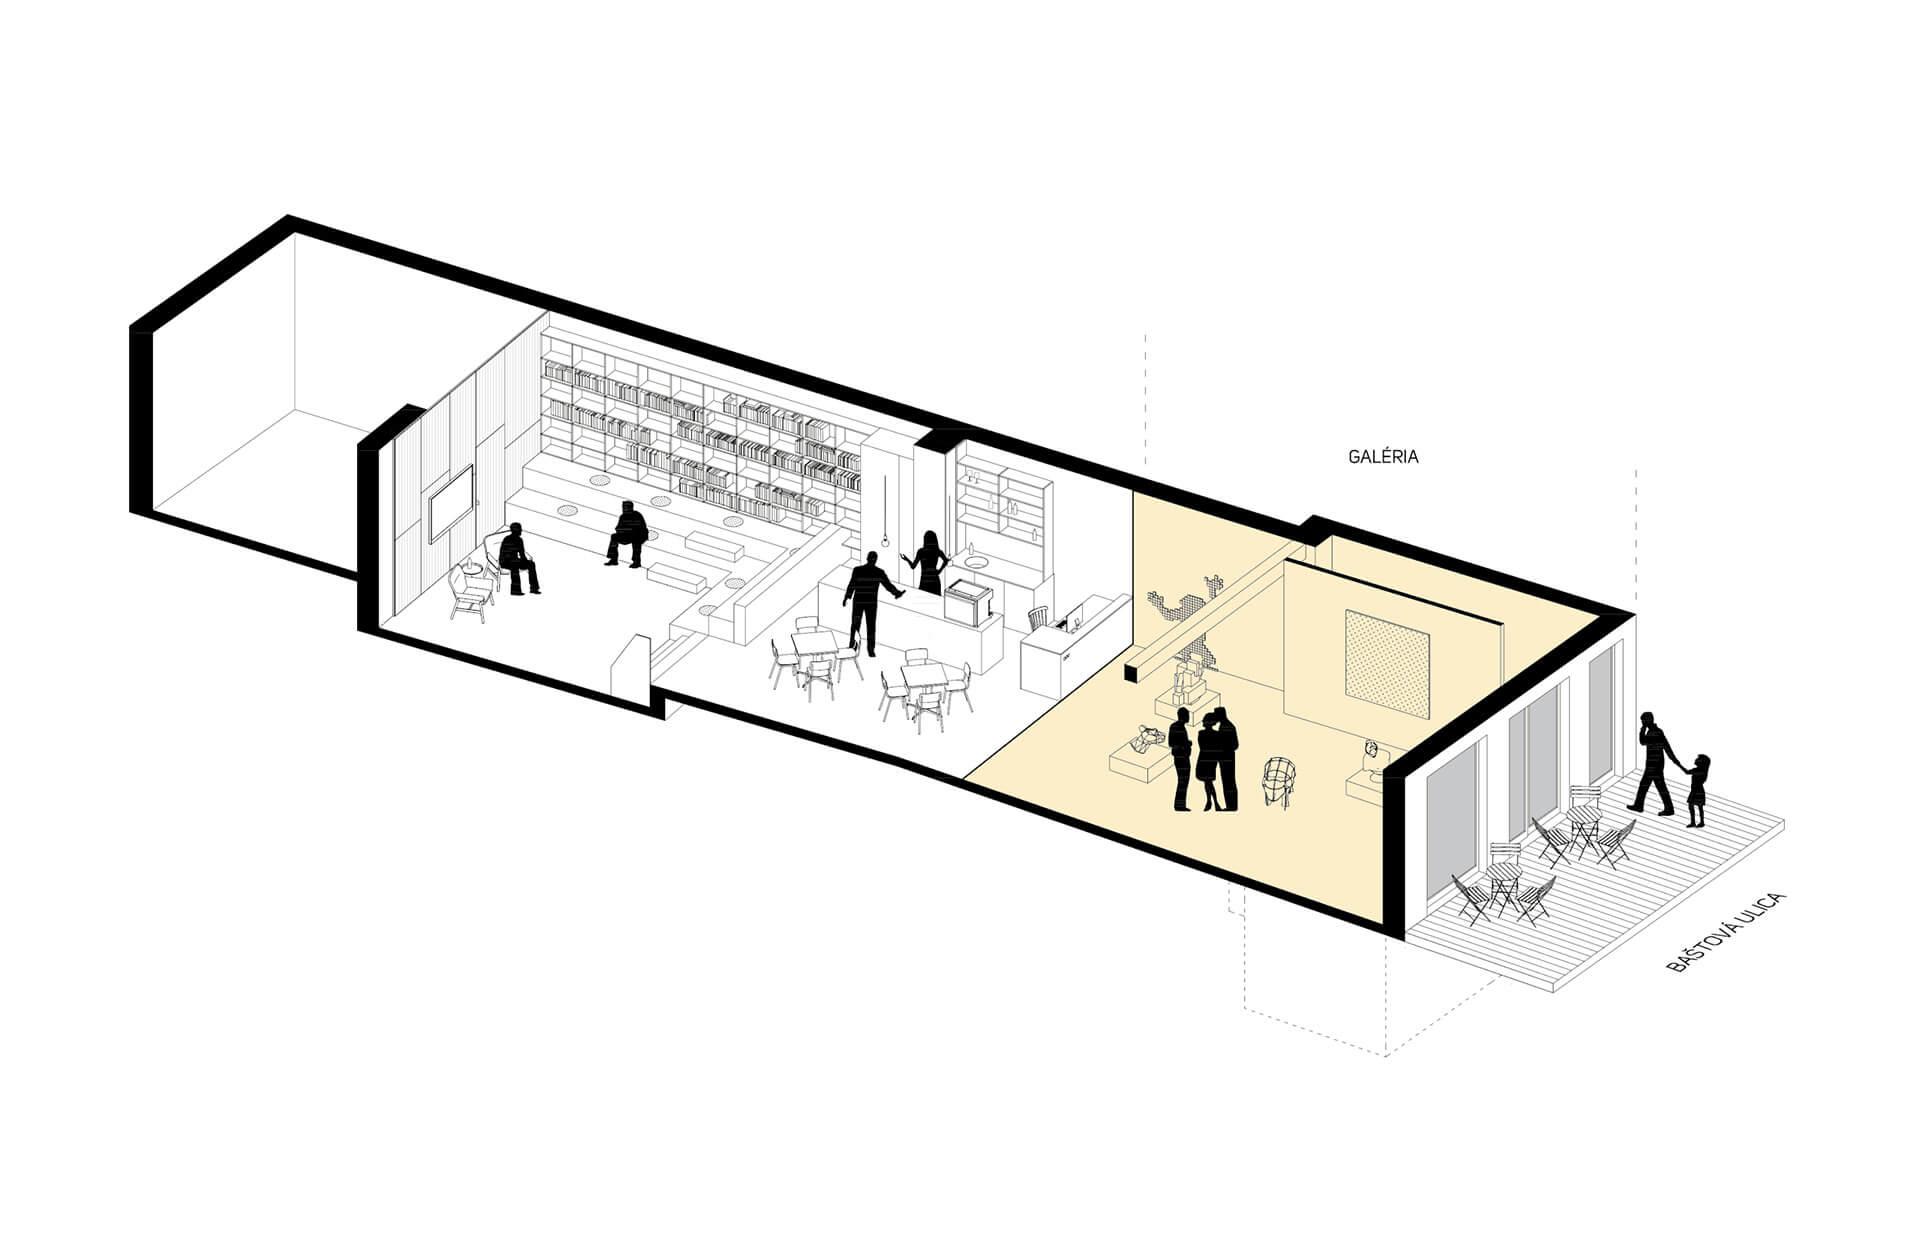 galeria-abc-bastova_schema_gif_5